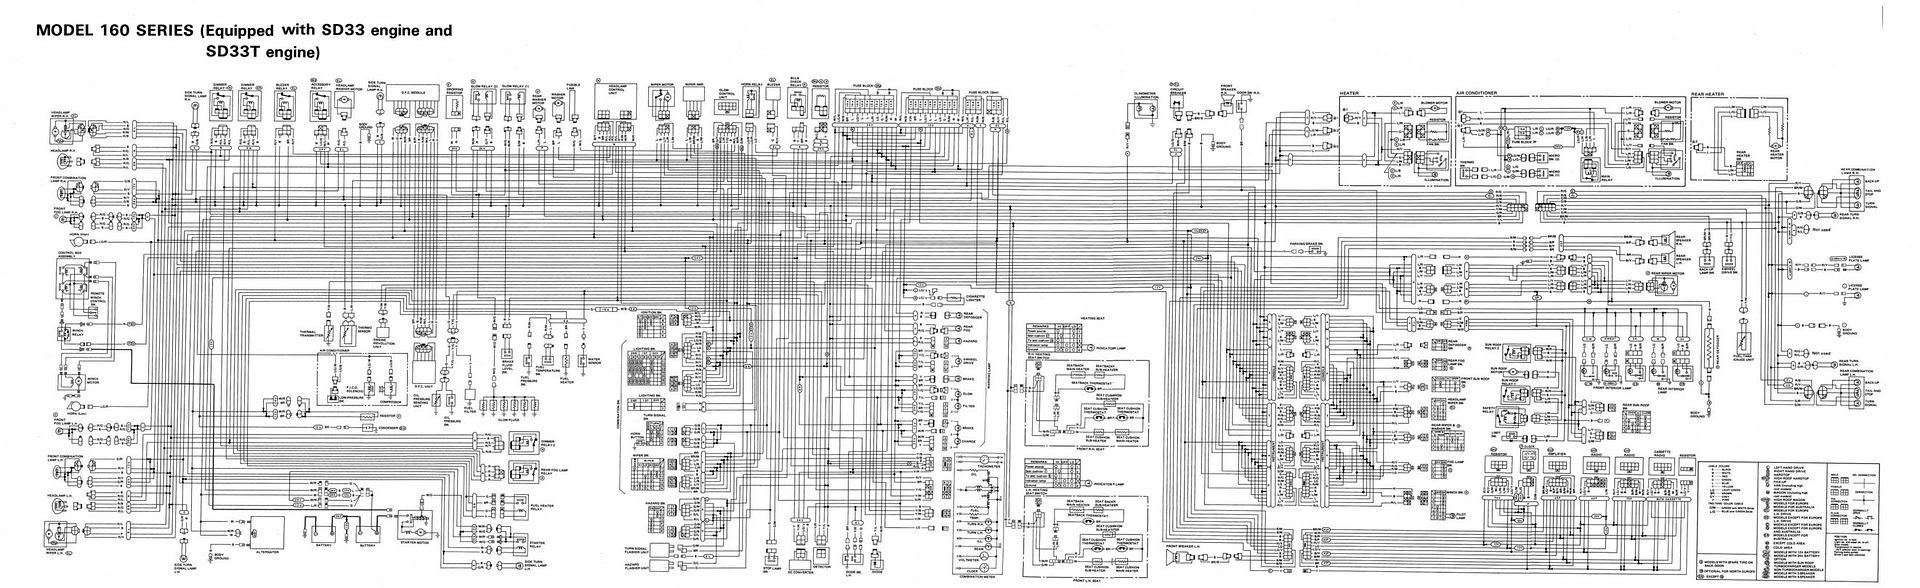 Nissan Patrol Electrical Wiring Diagram